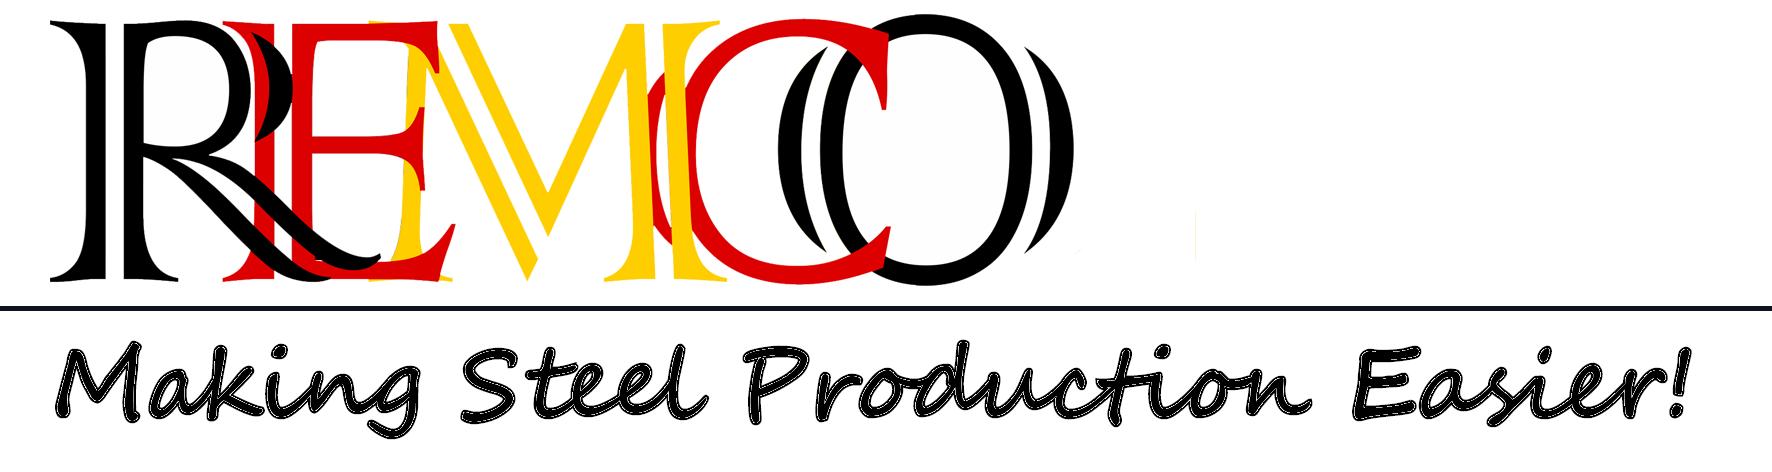 remco_duesseldorf_logo